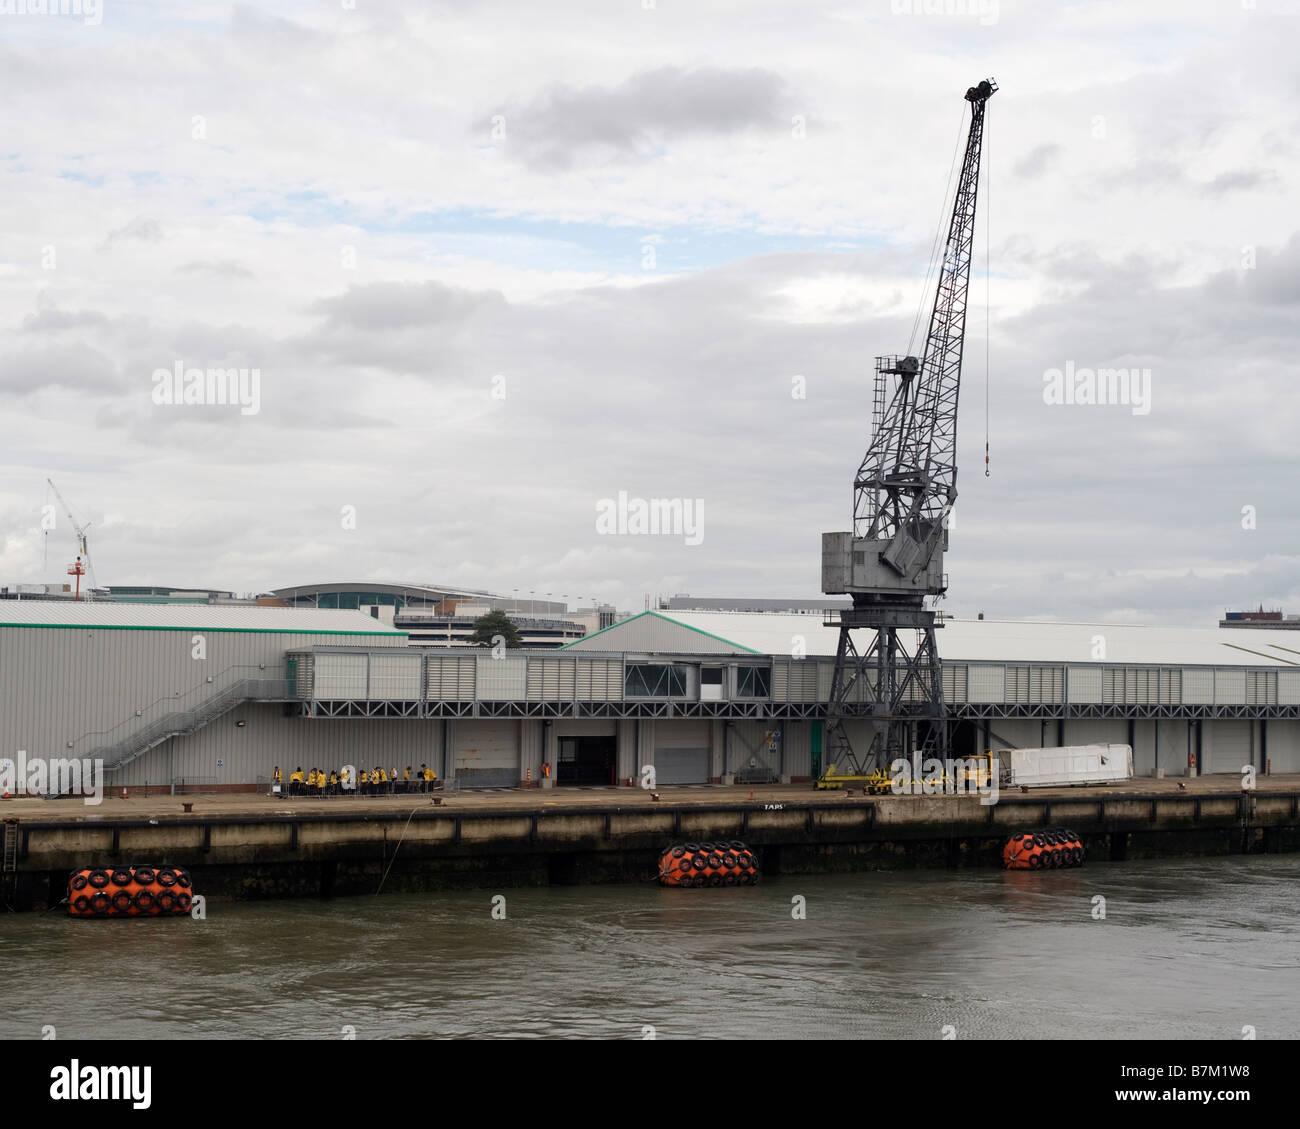 Dockside crane at the cruise ship terminal, Southampton England, UK. - Stock Image